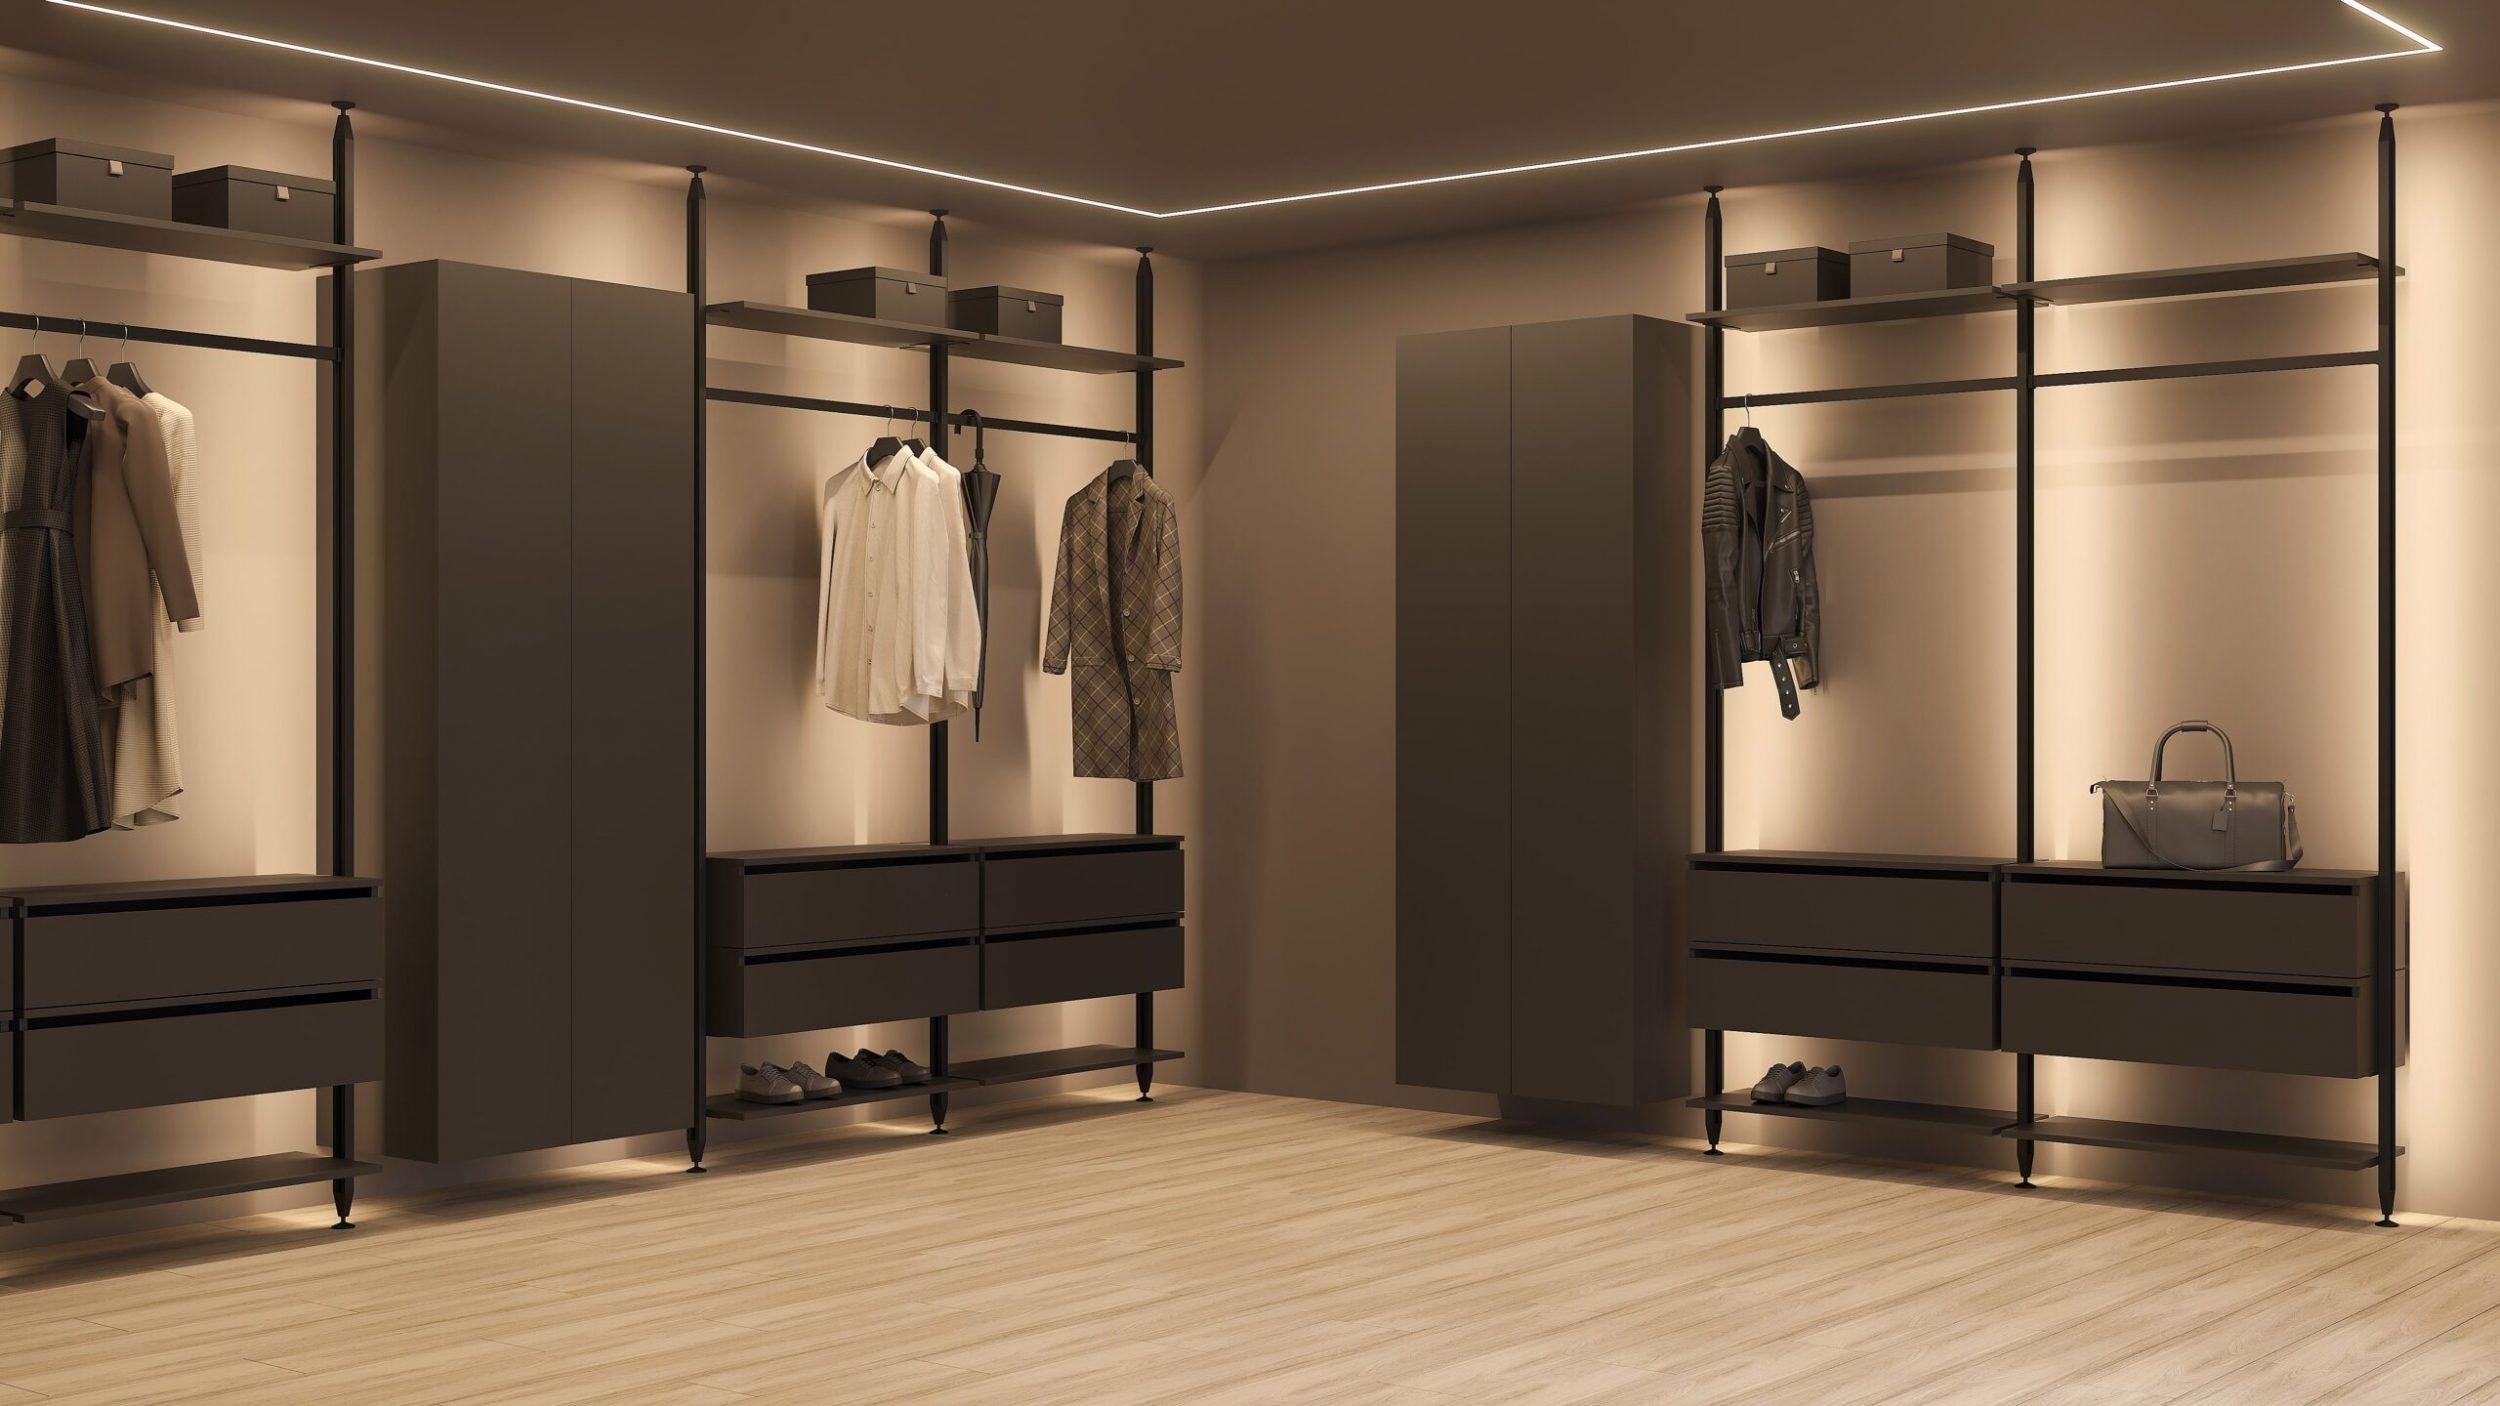 kitchen_studio_wardrobe_black_tie22-scaled